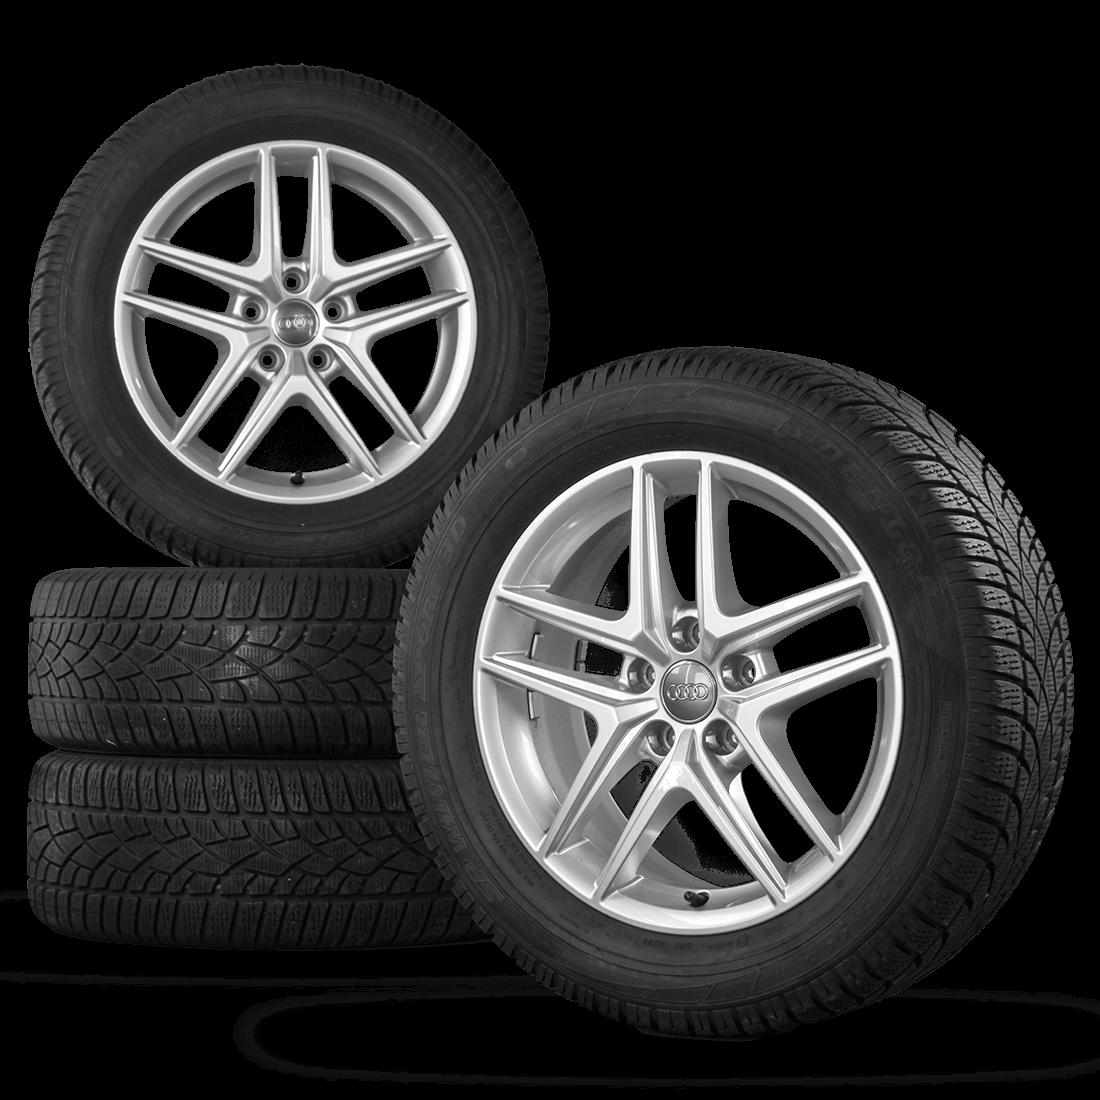 Audi 17 Inch A4 Allroad B9 8W Aluminum Rim Rims Winter